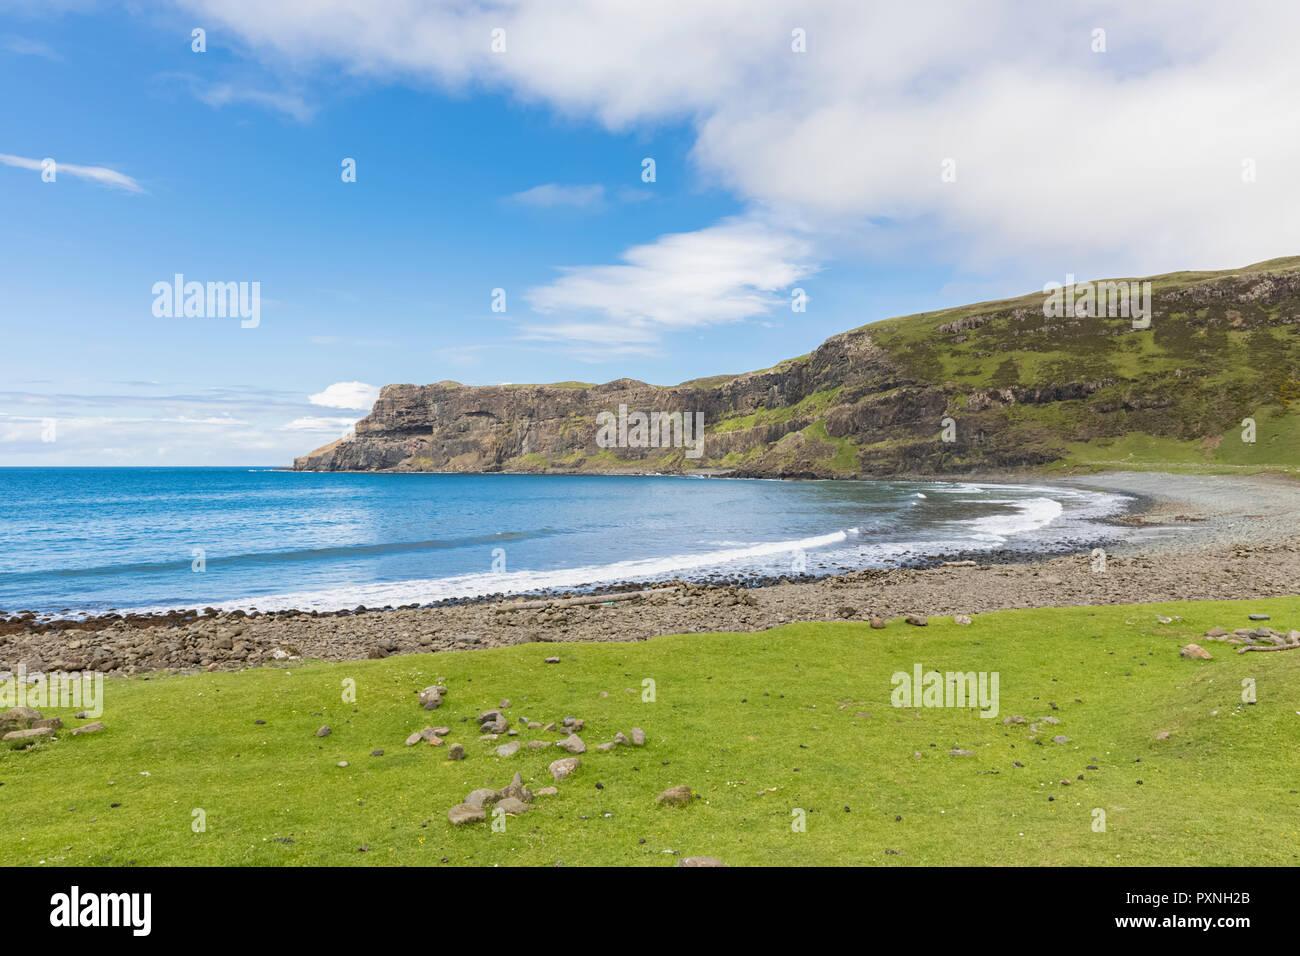 UK, Scotland, Inner Hebrides, Isle of Skye, scenic - Stock Image